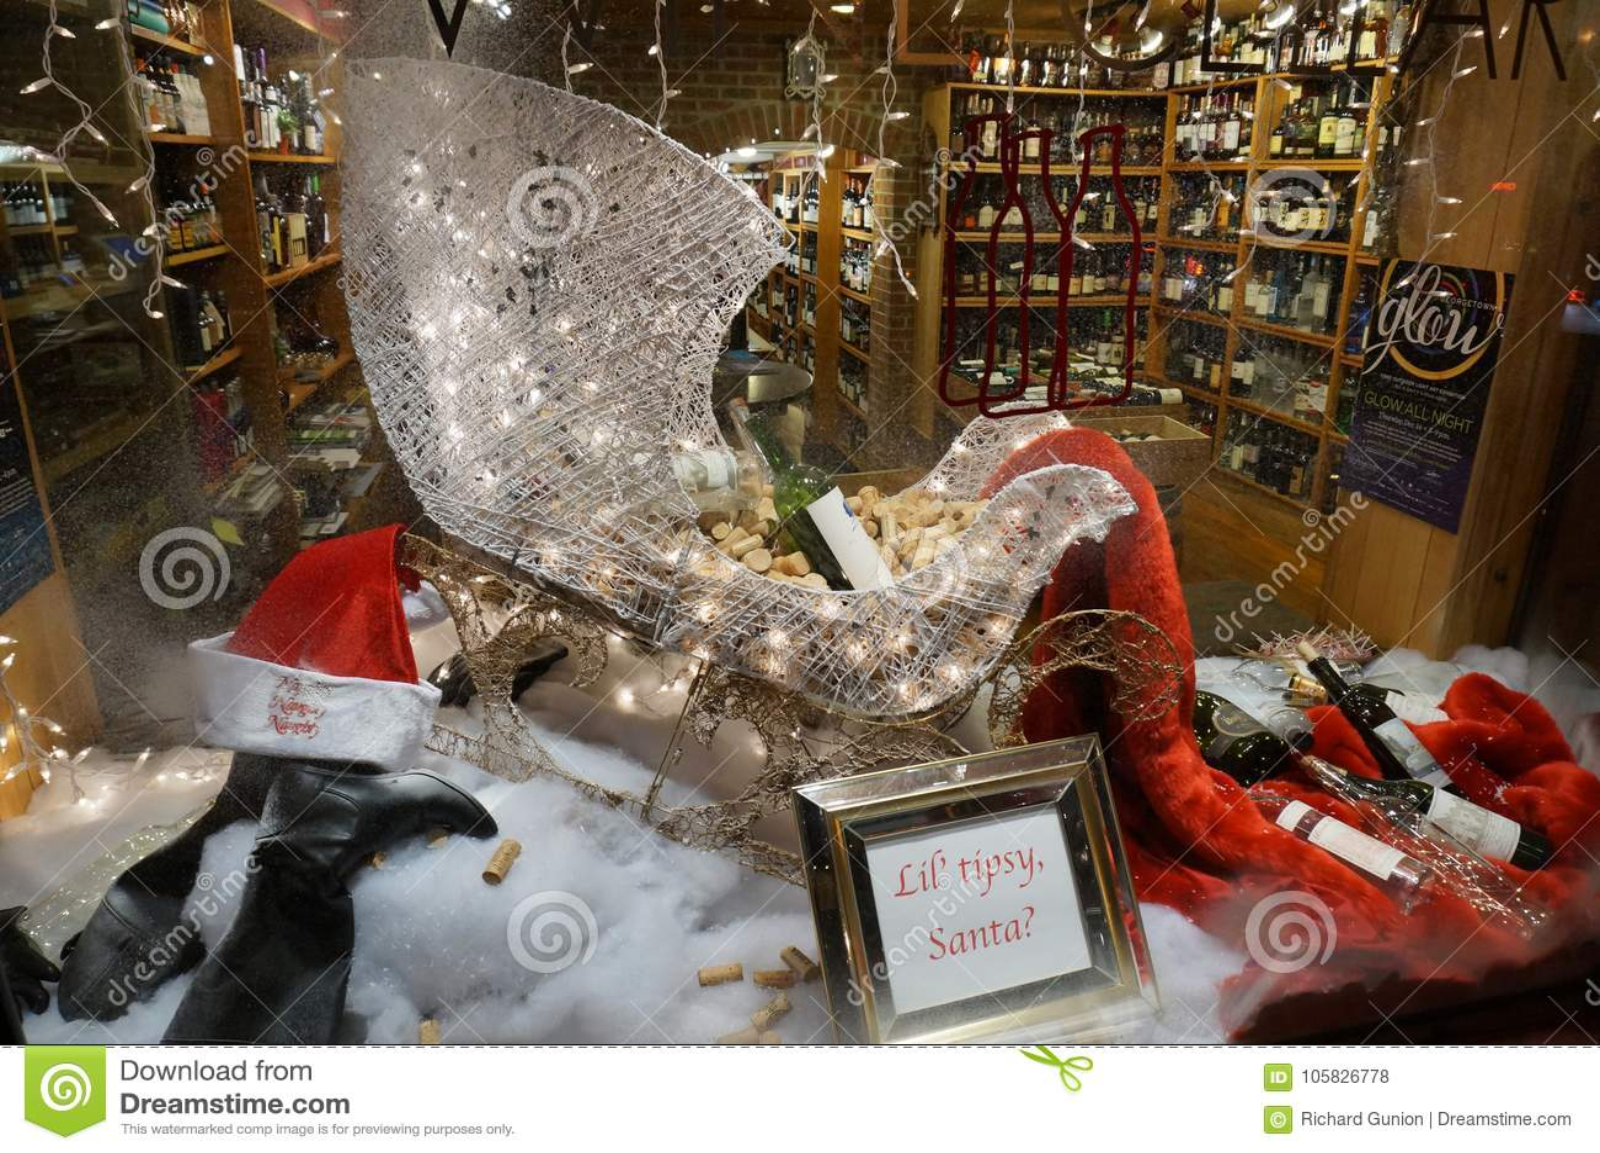 Christmas Liquor.Georgetown Liquor Store Christmas Display Editorial Stock